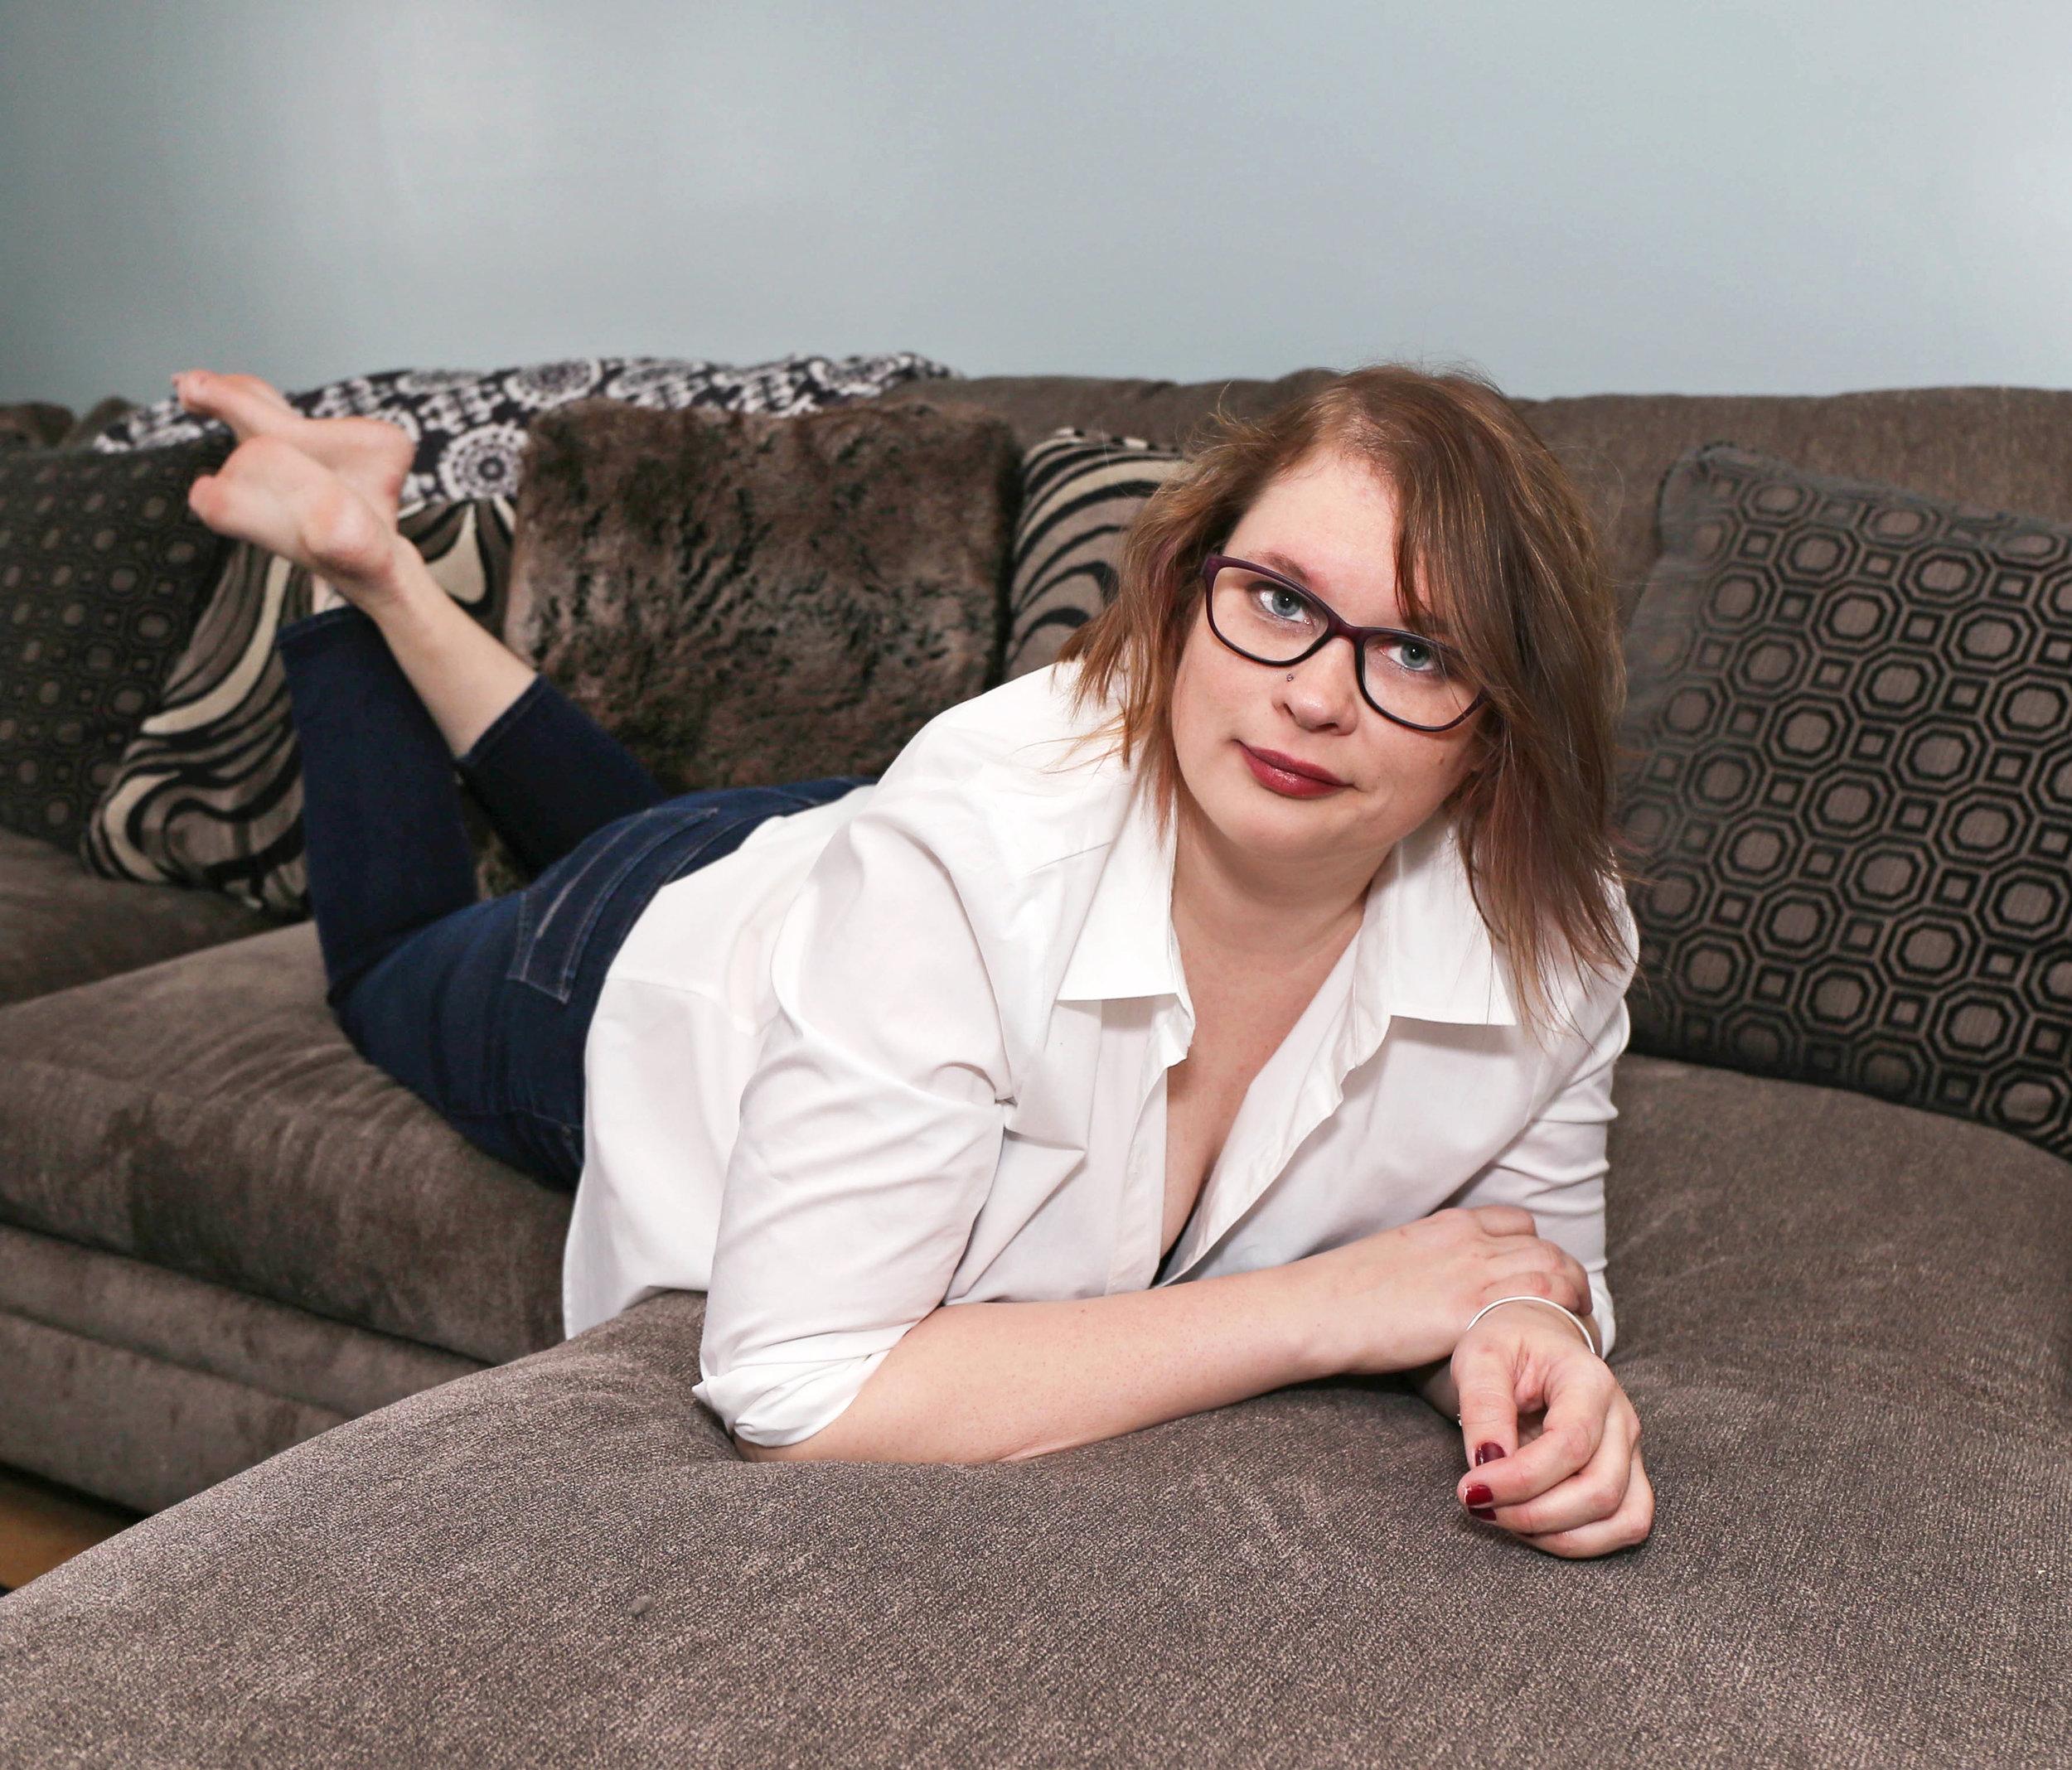 Stacy-7.jpg